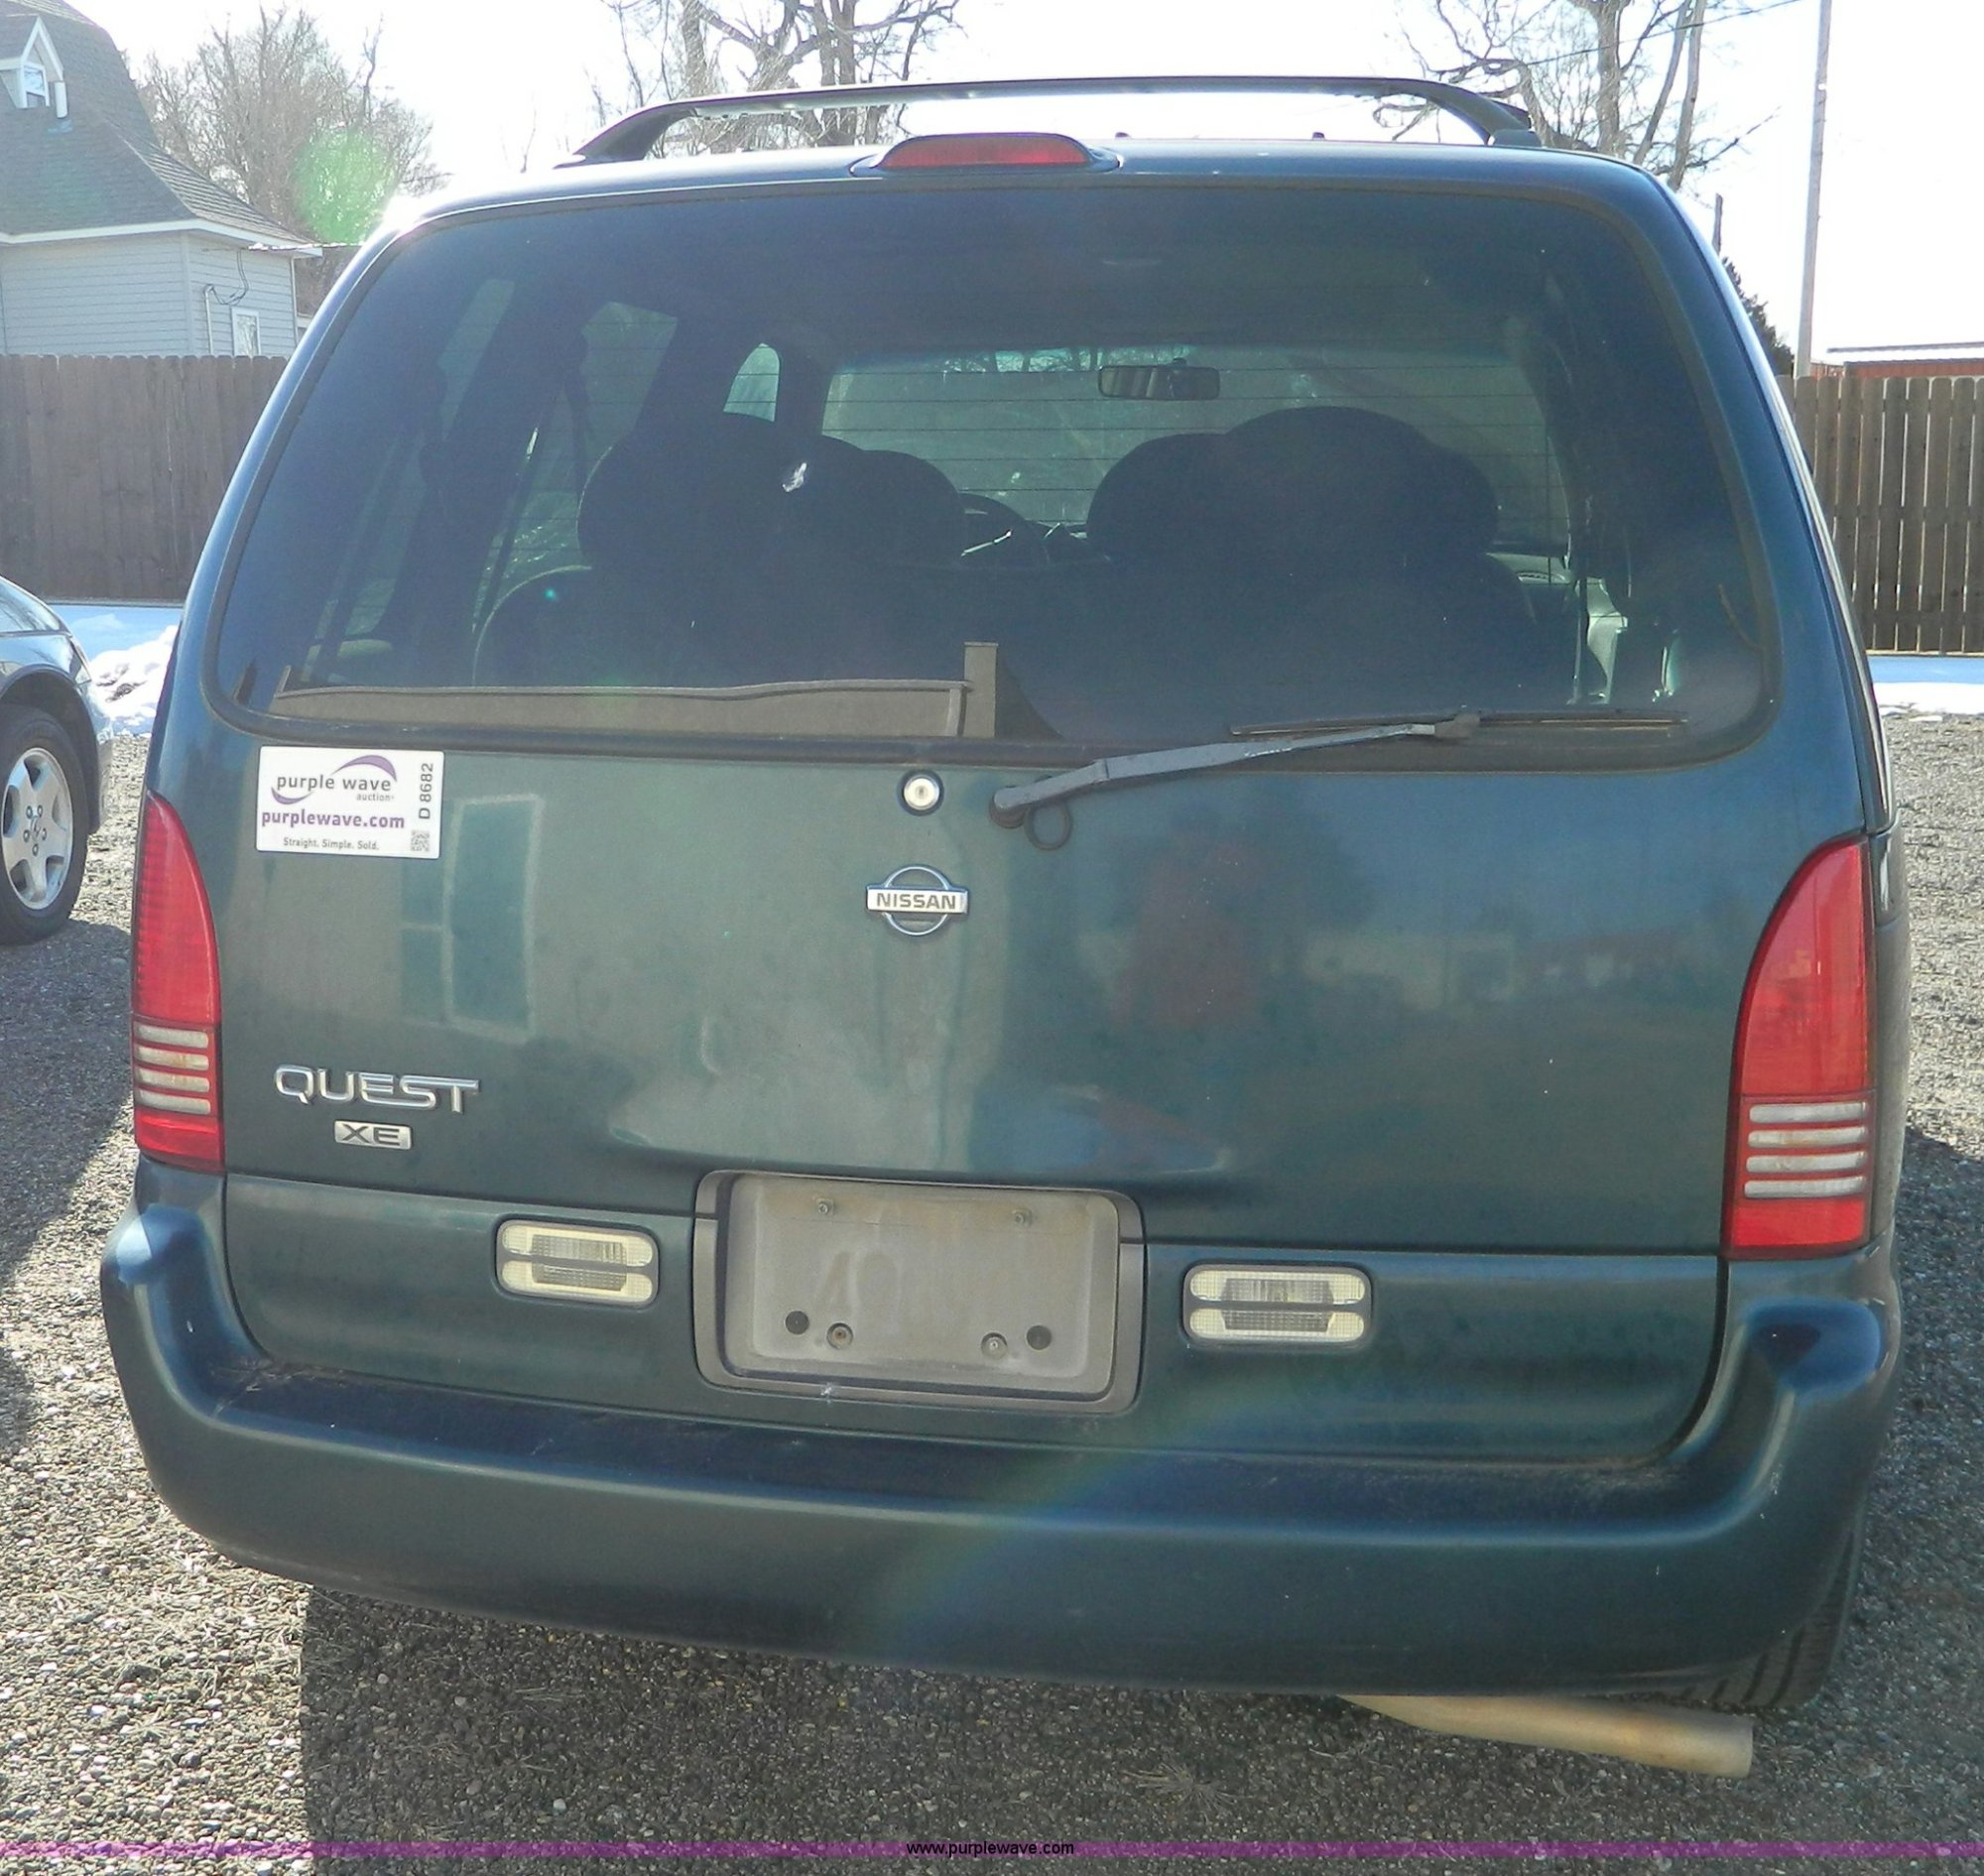 hight resolution of  1998 nissan quest mini van full size in new window